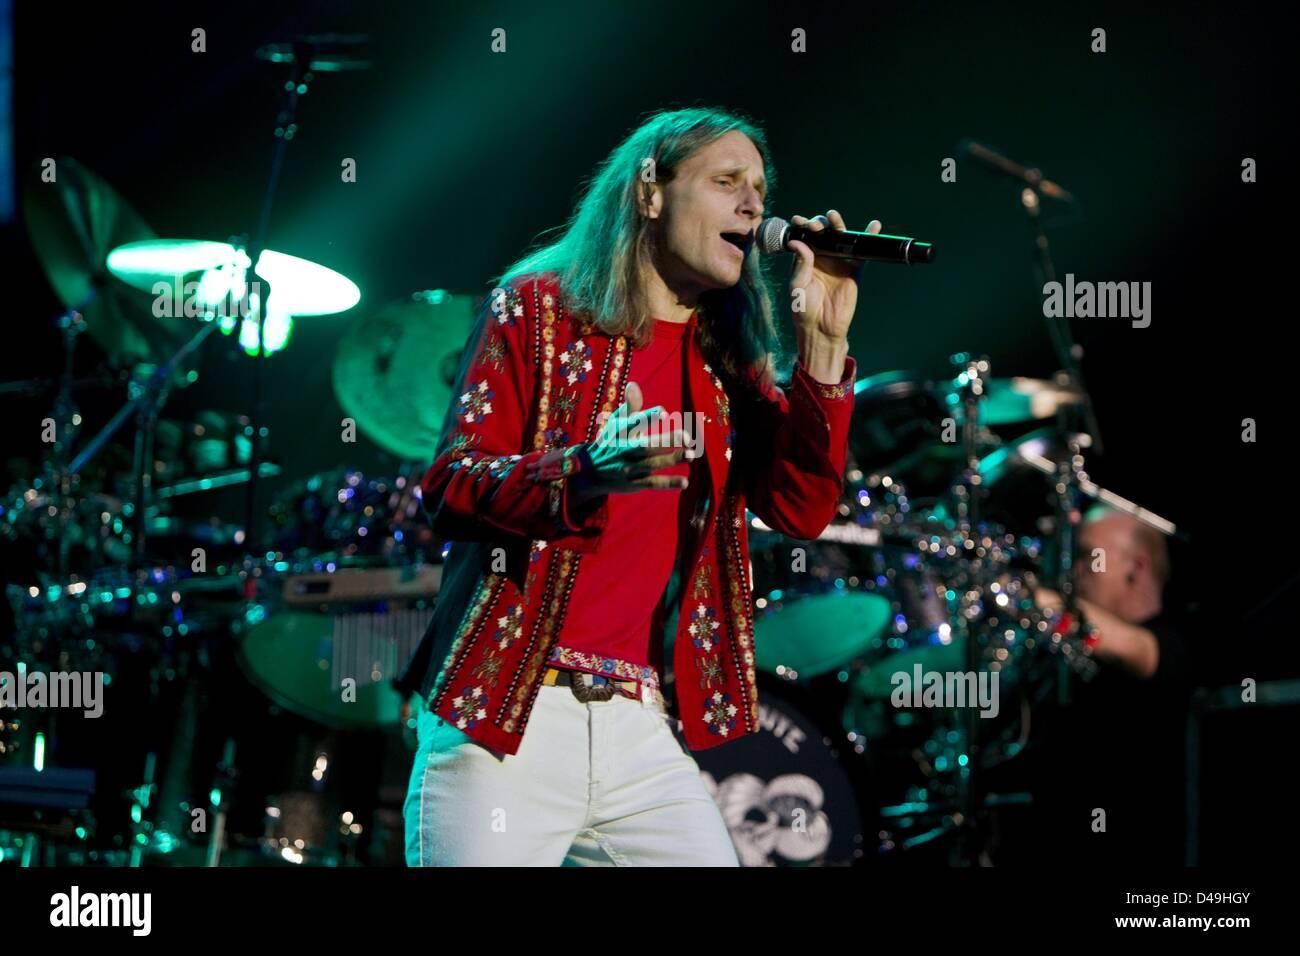 March 8, 2013 - Temecula, CA, USA - Vocalist JON DAVISON performs